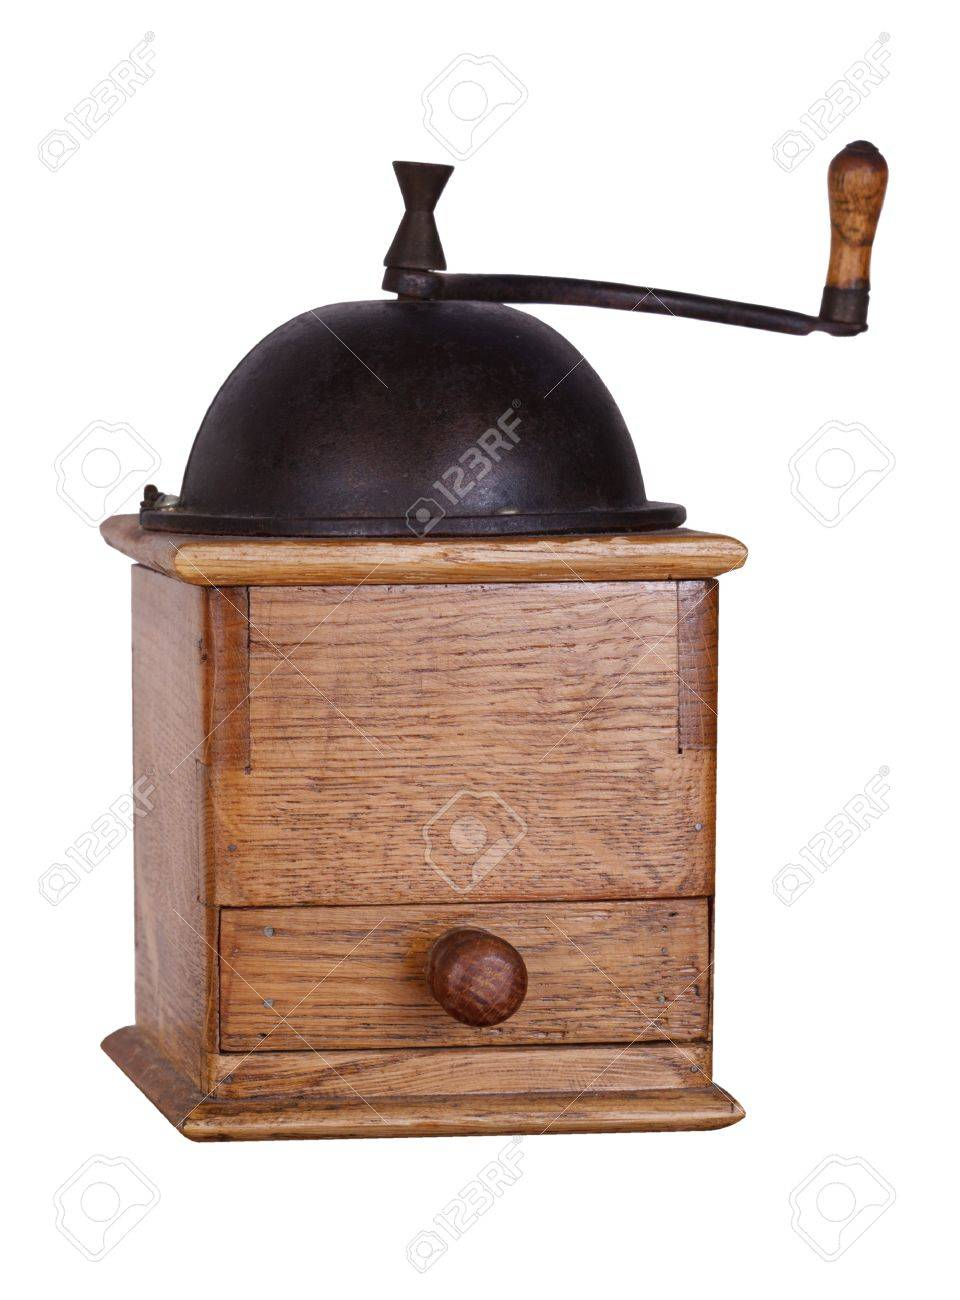 Vintage coffee mill Stock Photo - 18197017